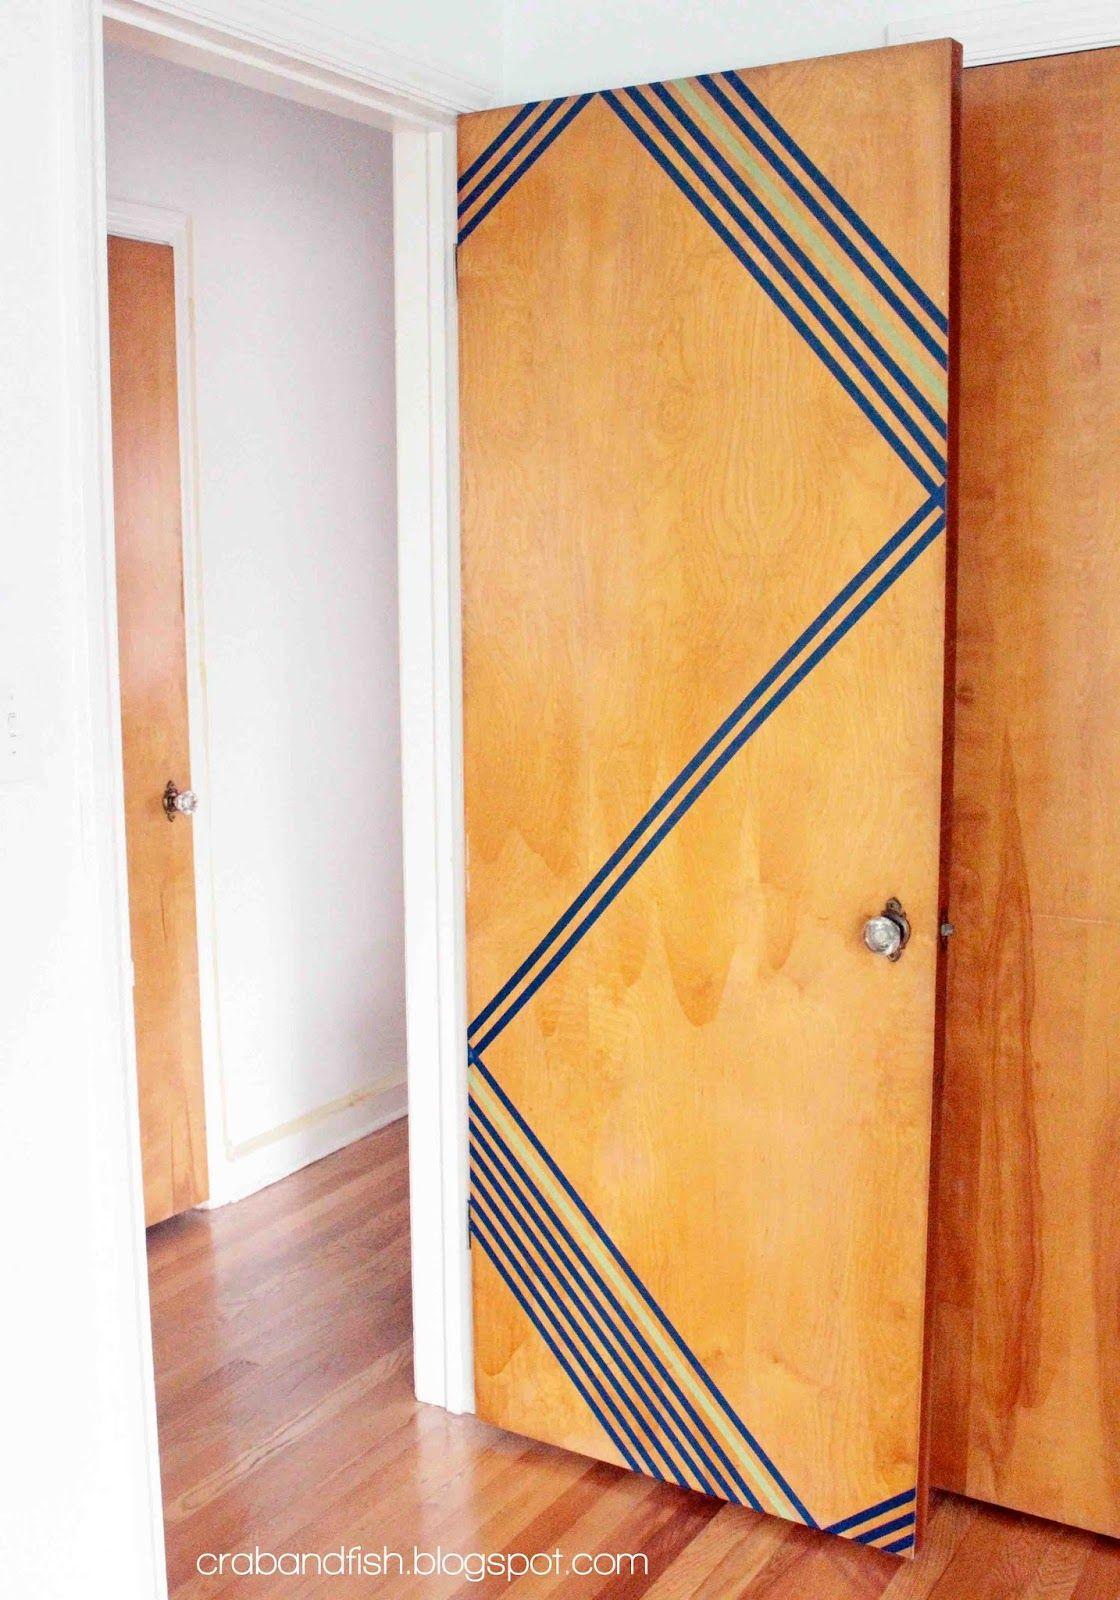 10 Ways to Make a Dorm Room Feel Like Home | Dorm, Dorm rooms and Doors